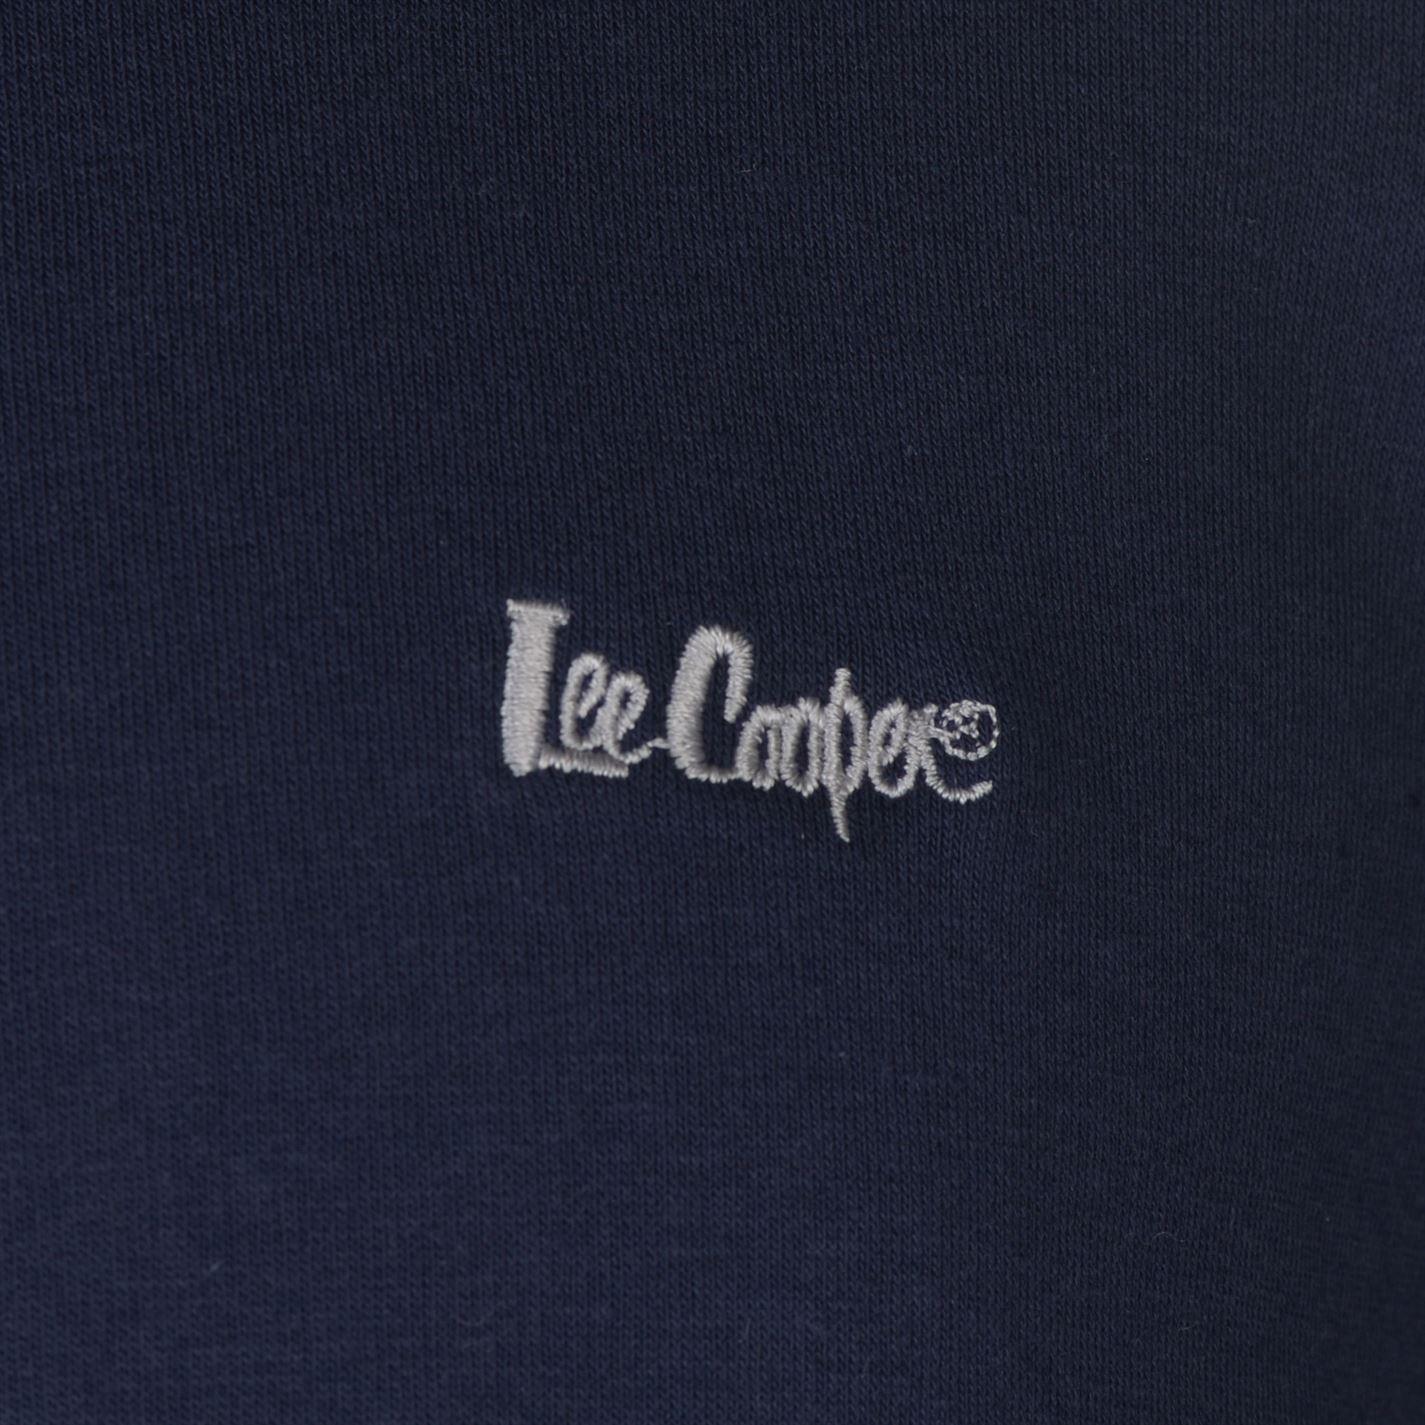 Details about Lee Cooper Cut and Sew Zipped Hoody Mens Gents Zip Hoodie Hooded Top Full Length